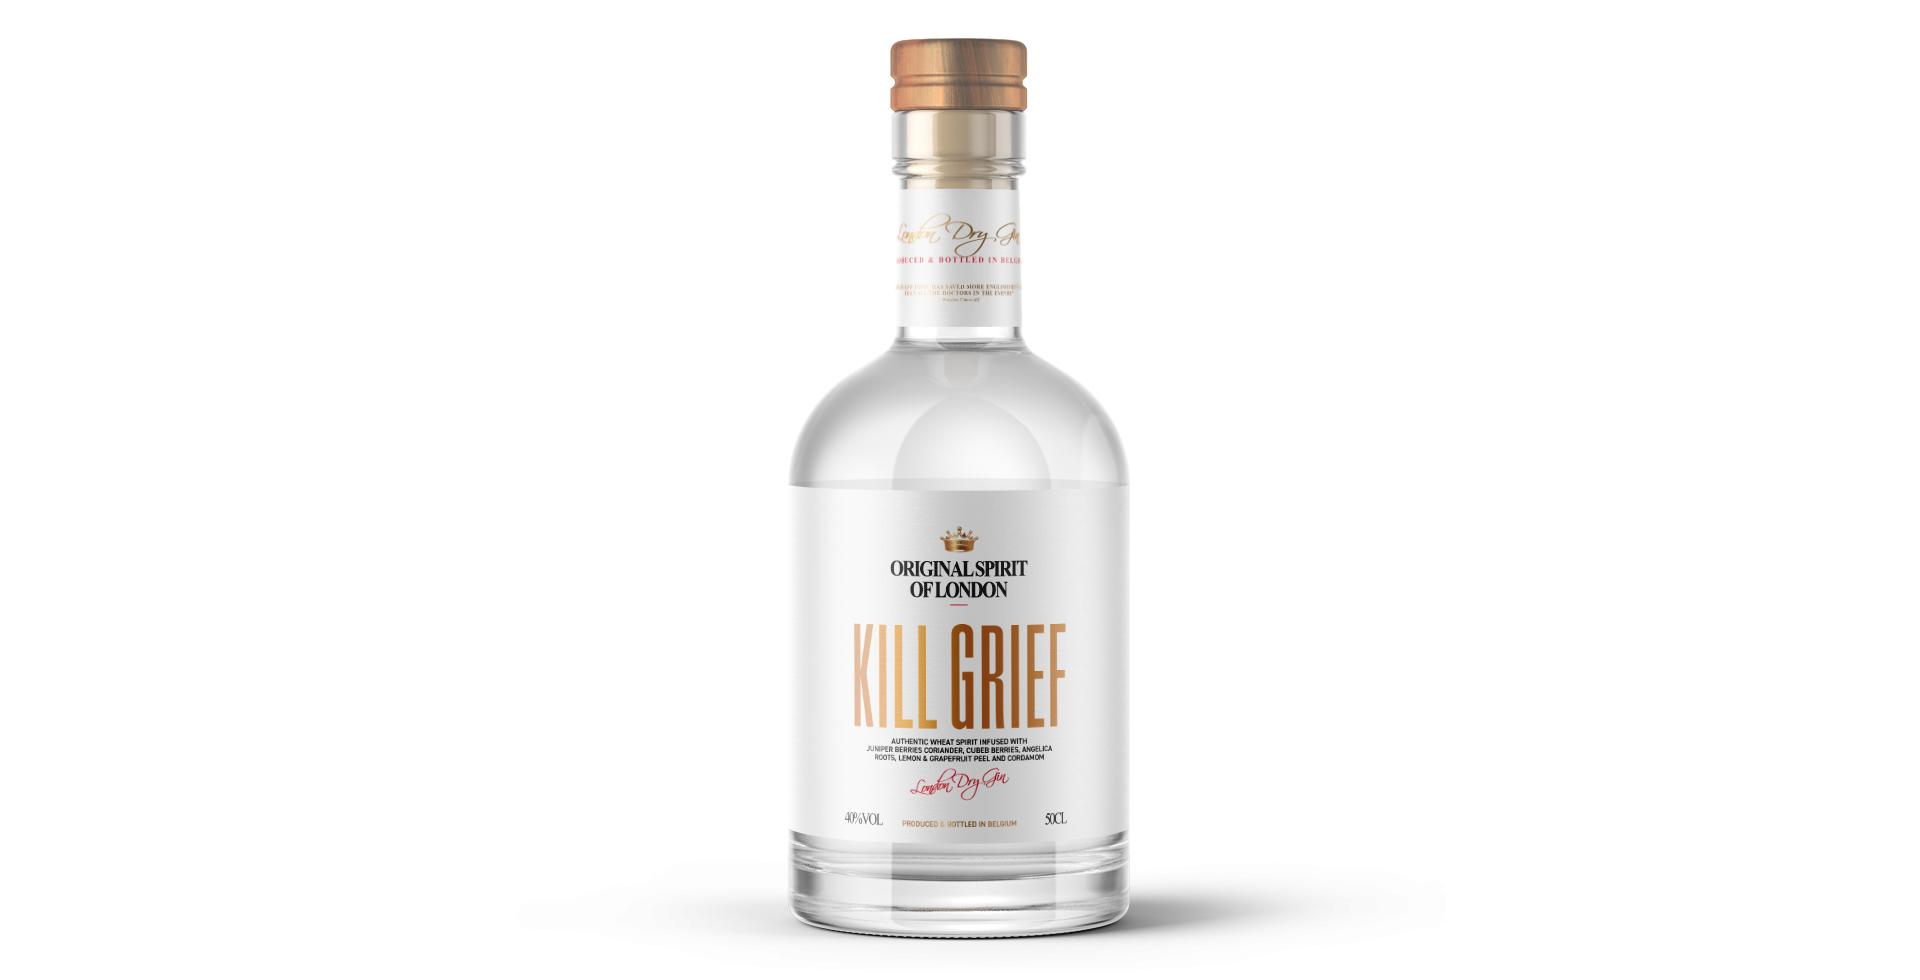 Kill Grief Bottle Design